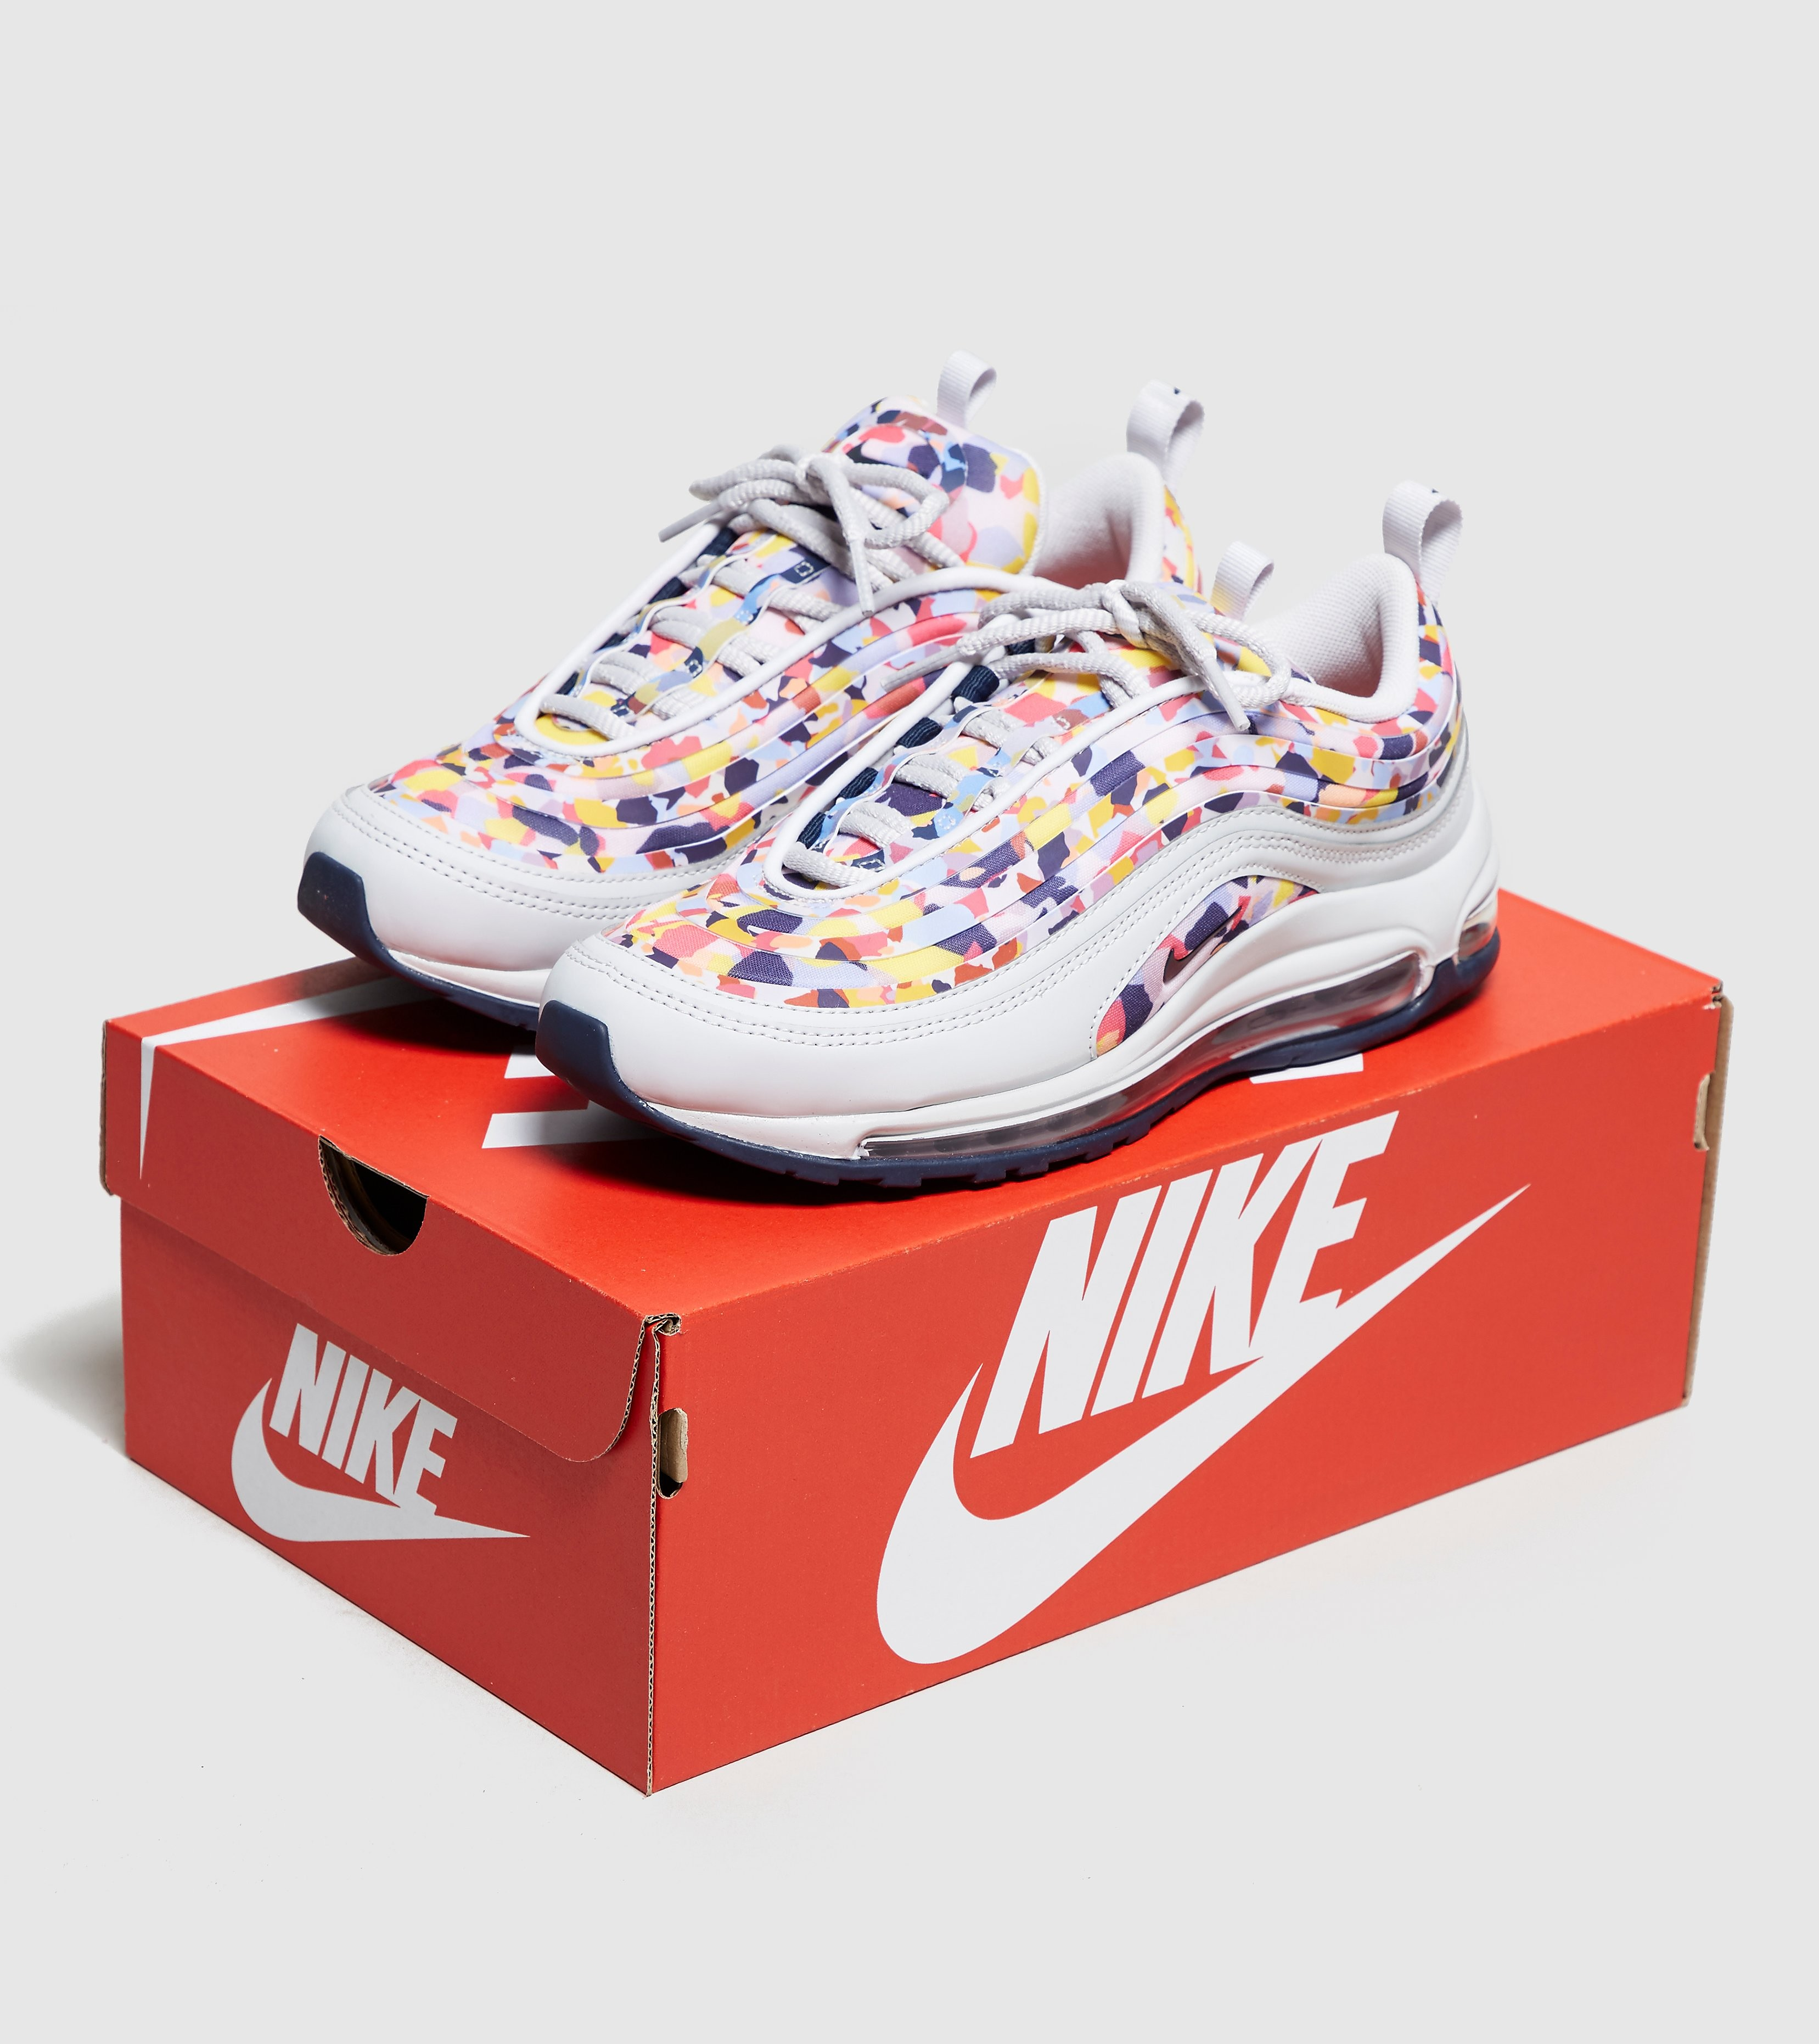 Nike Air Max 97 Ultra Terrazzo Women's